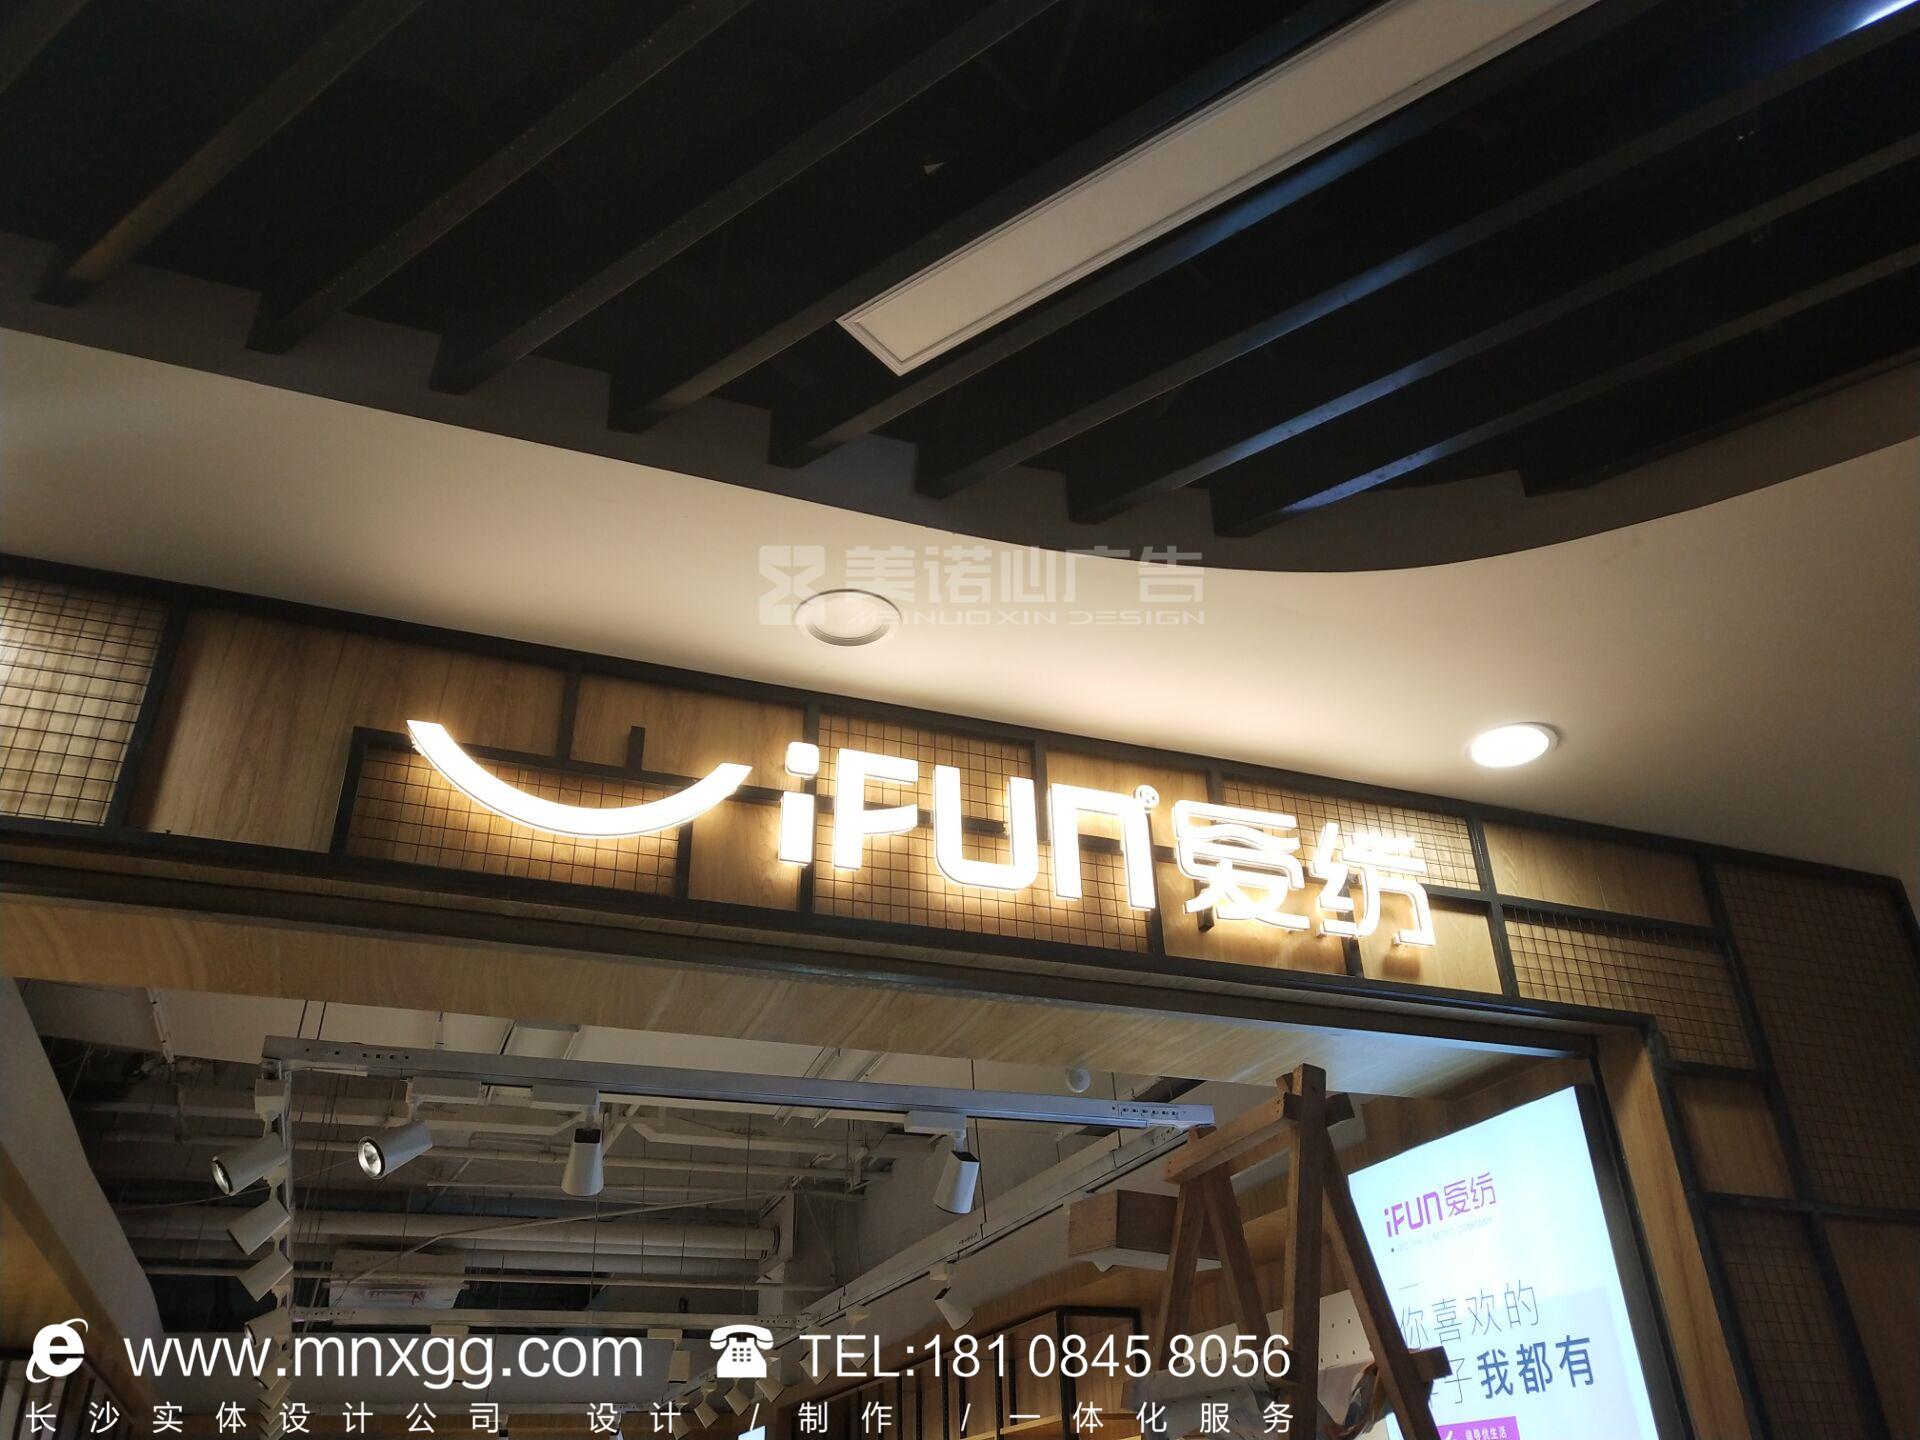 IFUN爱纺——店面门头发光字、软膜灯箱